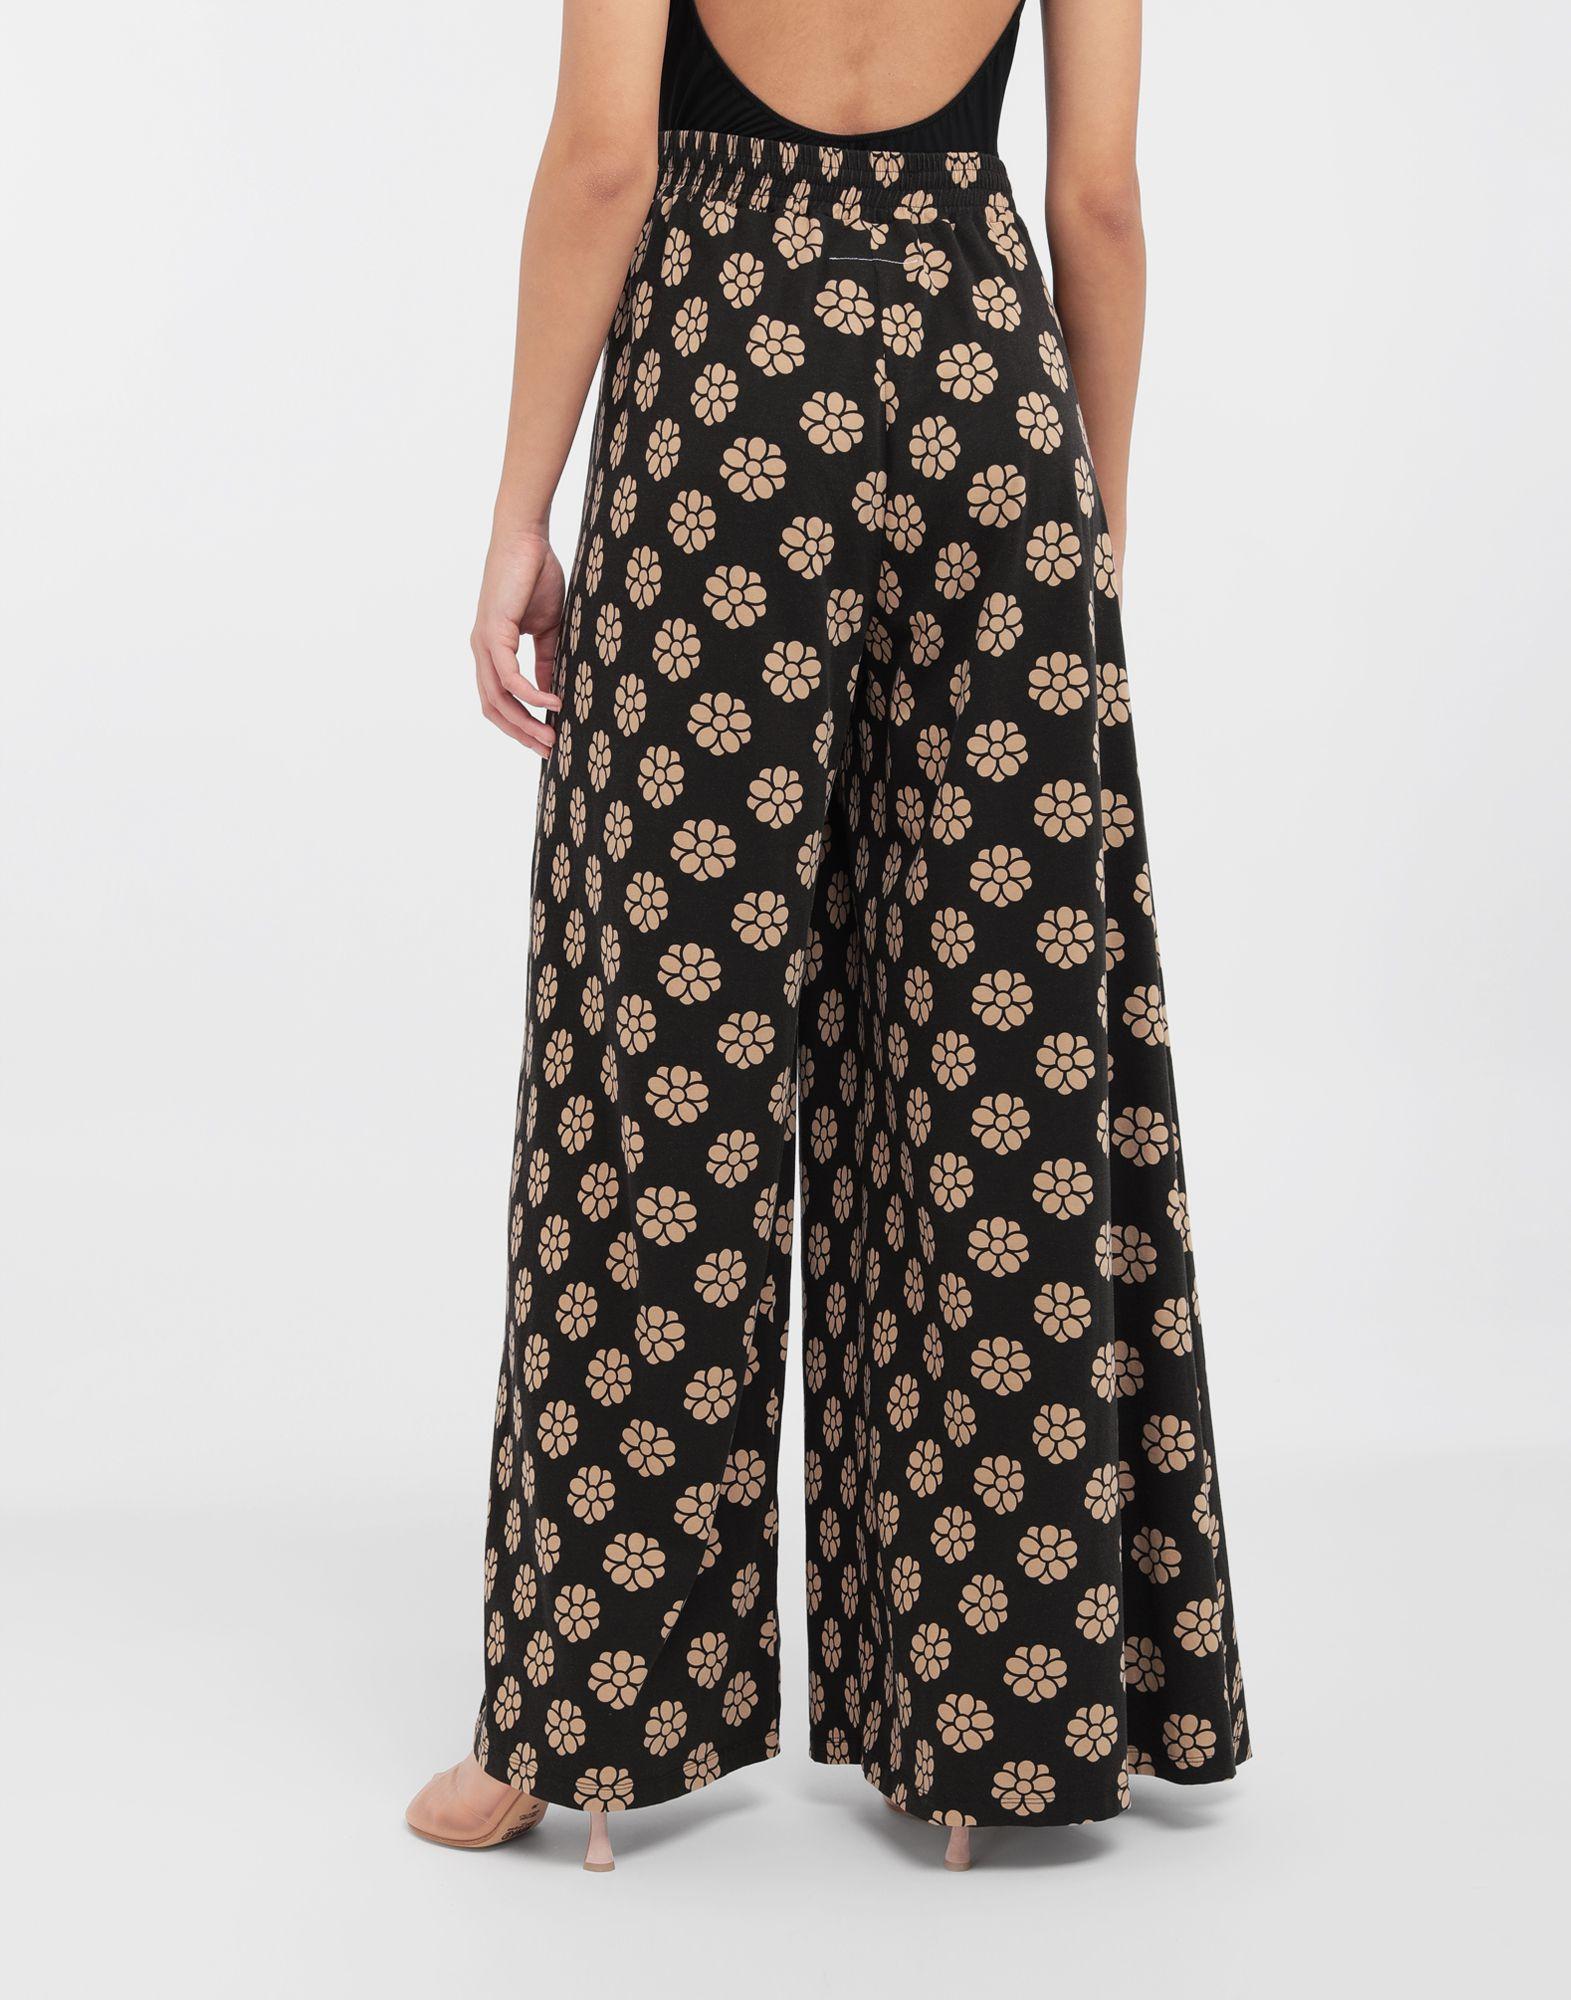 MM6 MAISON MARGIELA Polka dot flower-print pants Trousers Woman e